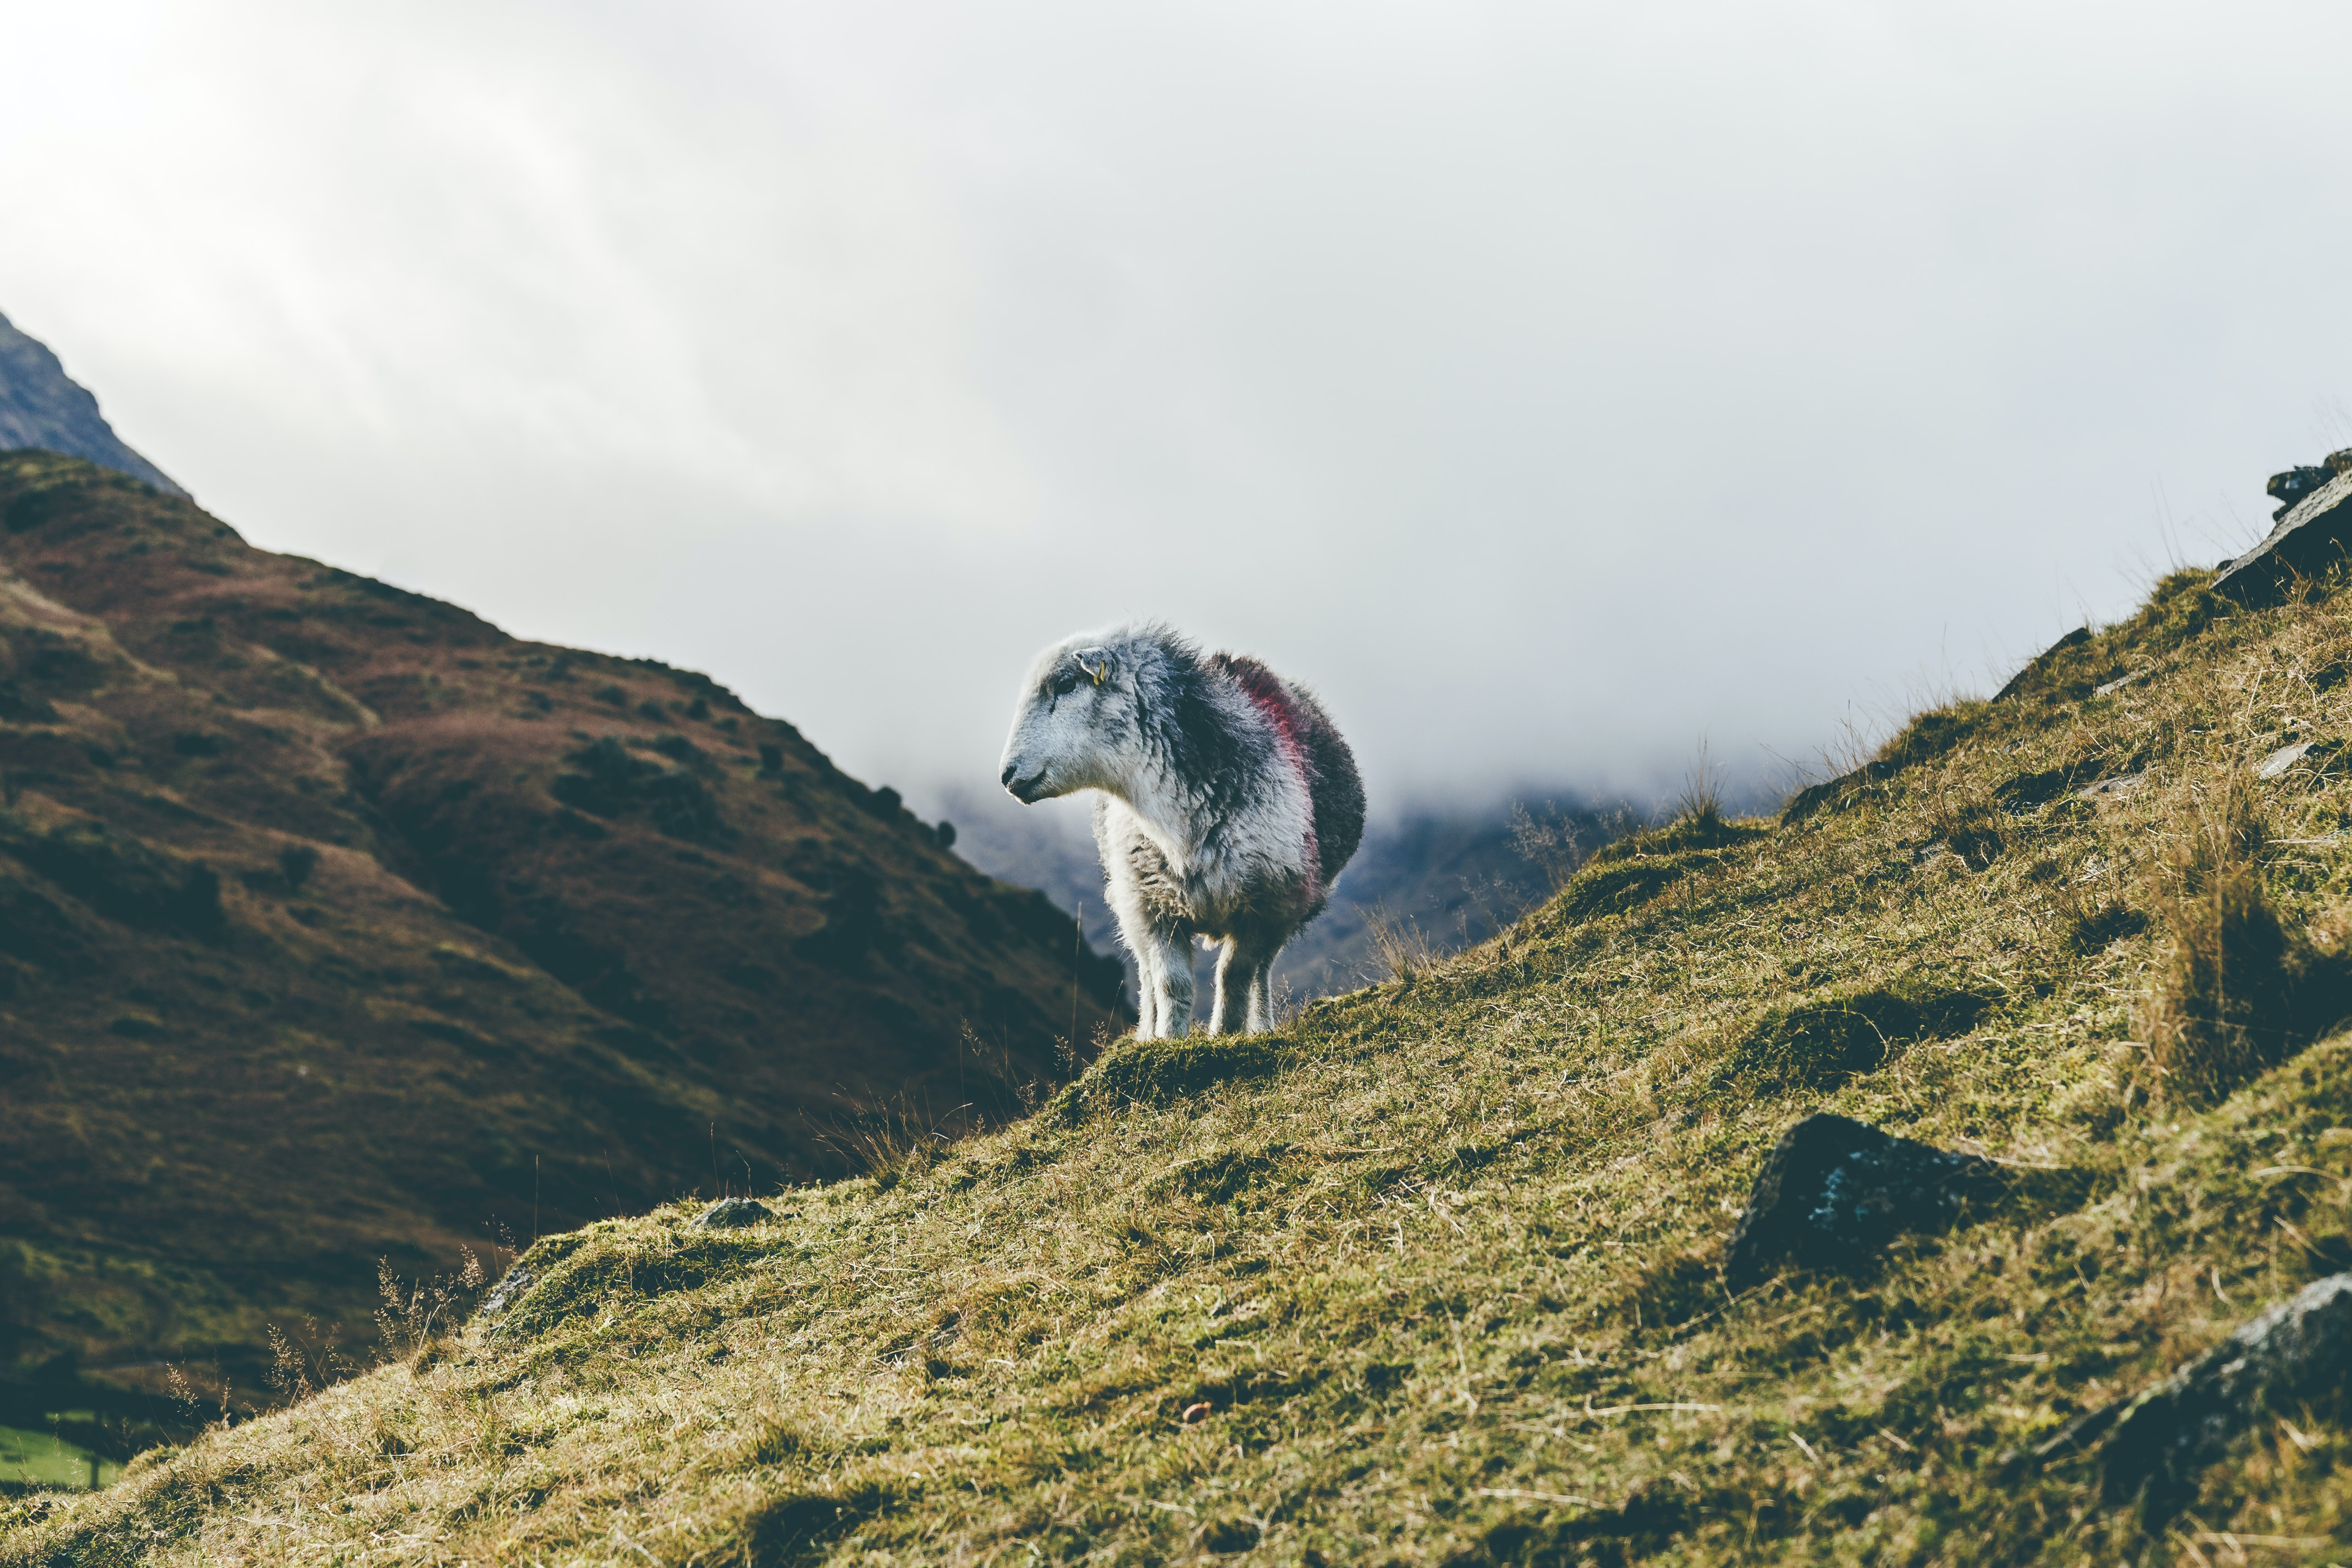 white mountain goat looking towards left